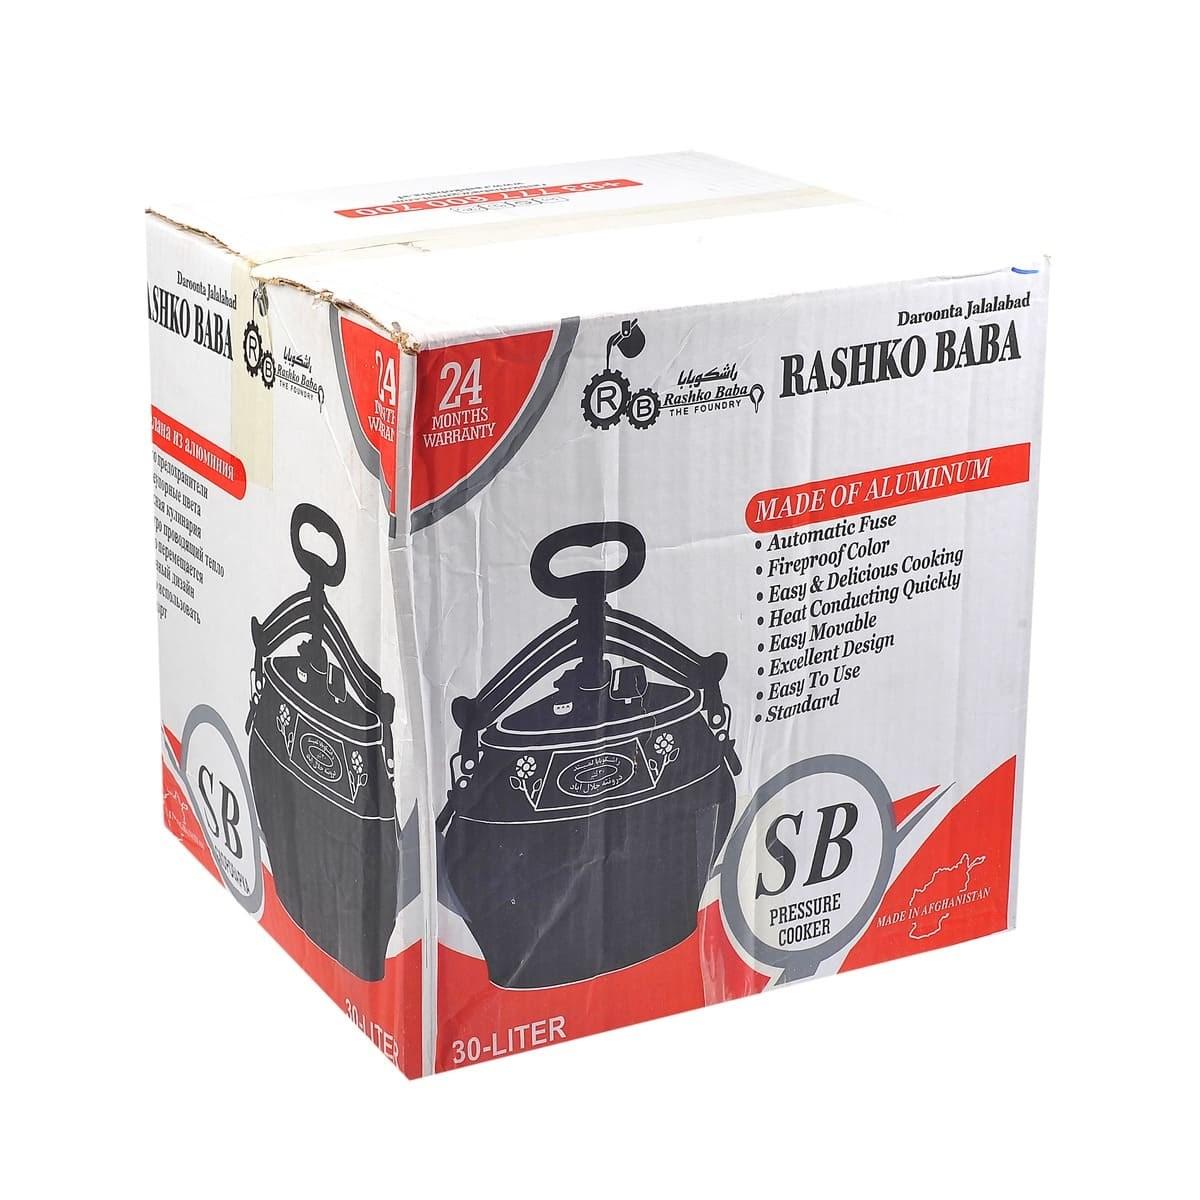 Афганский казан-скороварка 10 литров черный, алюминий Rashko Baba ltd - фото 12854